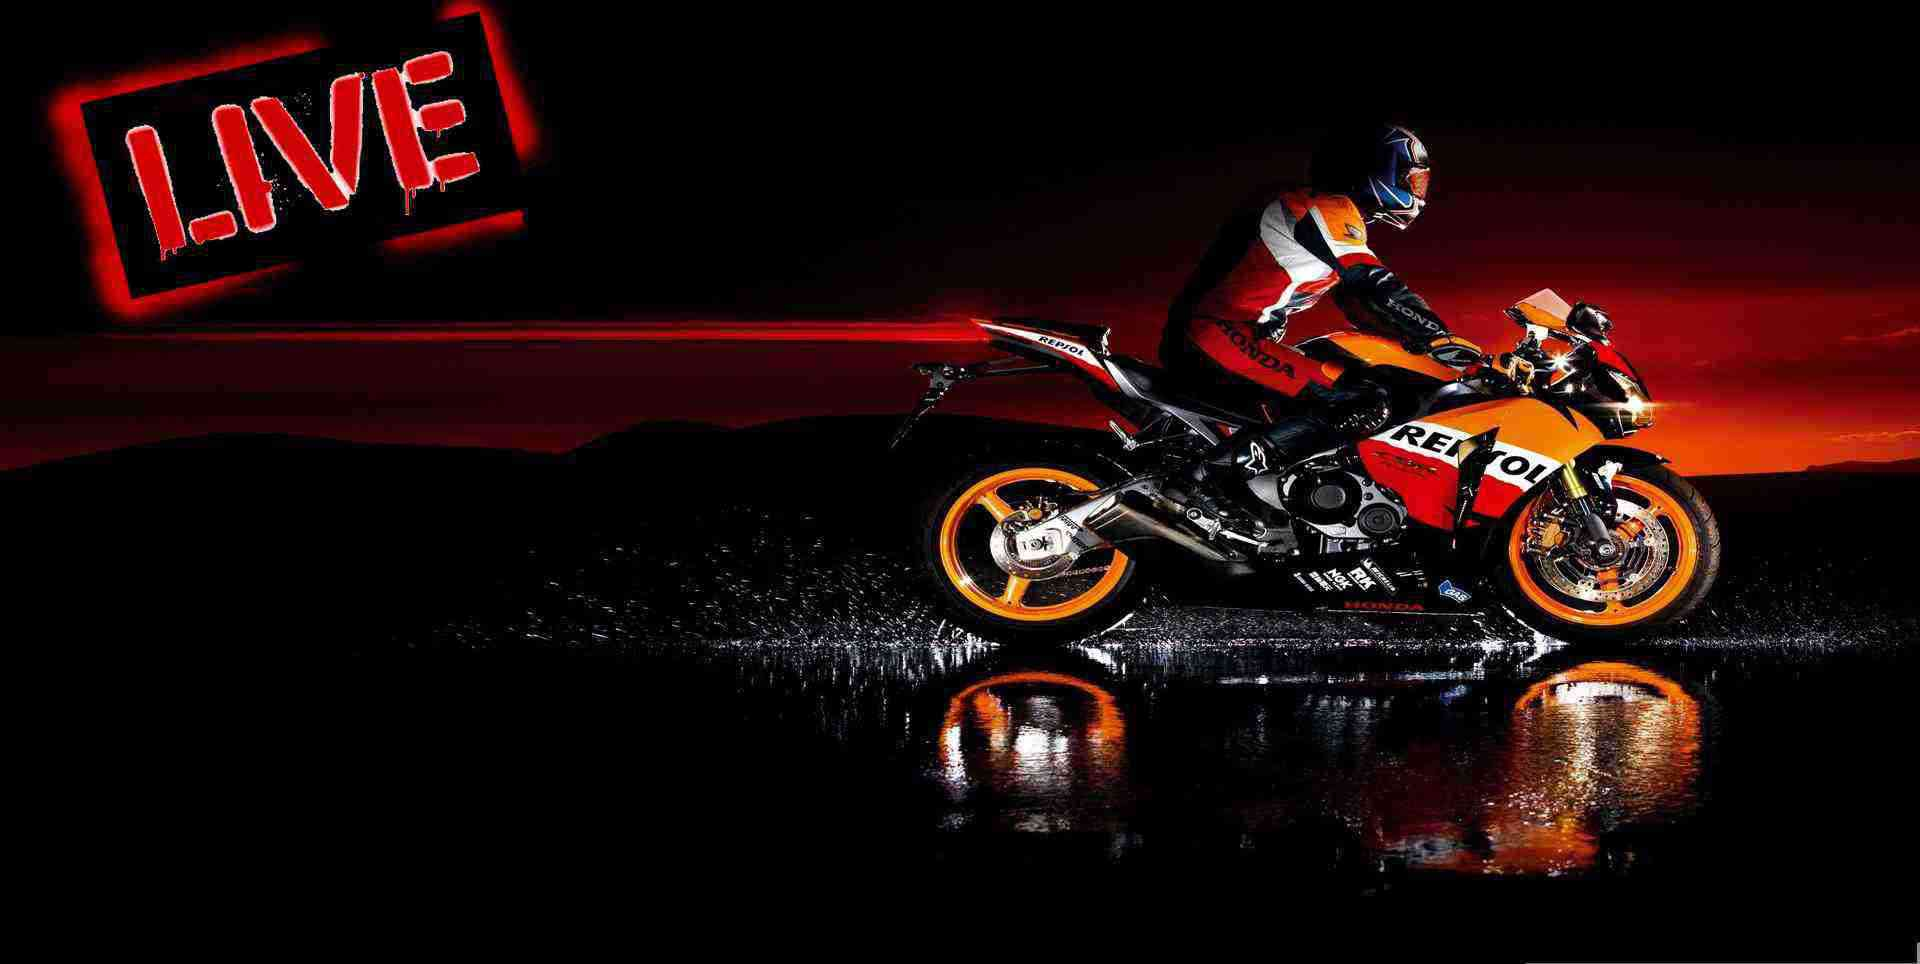 pirelli-qatar-round-2015-race-live